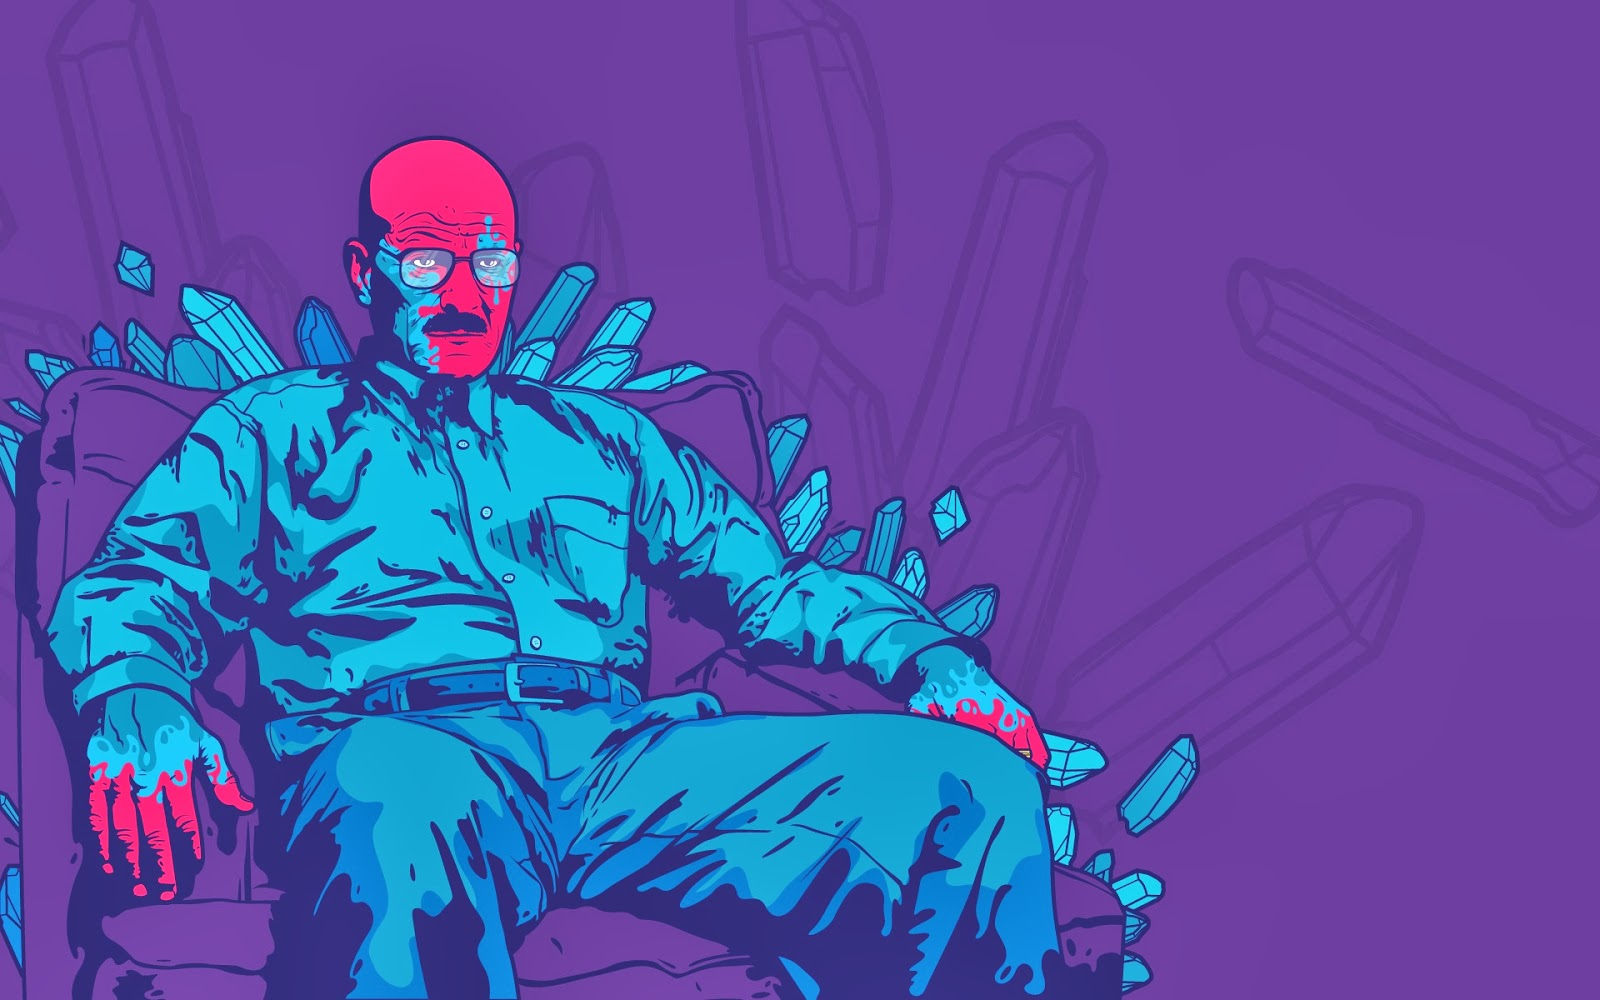 Killzone Shadow Fall 1080p Wallpaper Wallpapers HD: Wallpap...